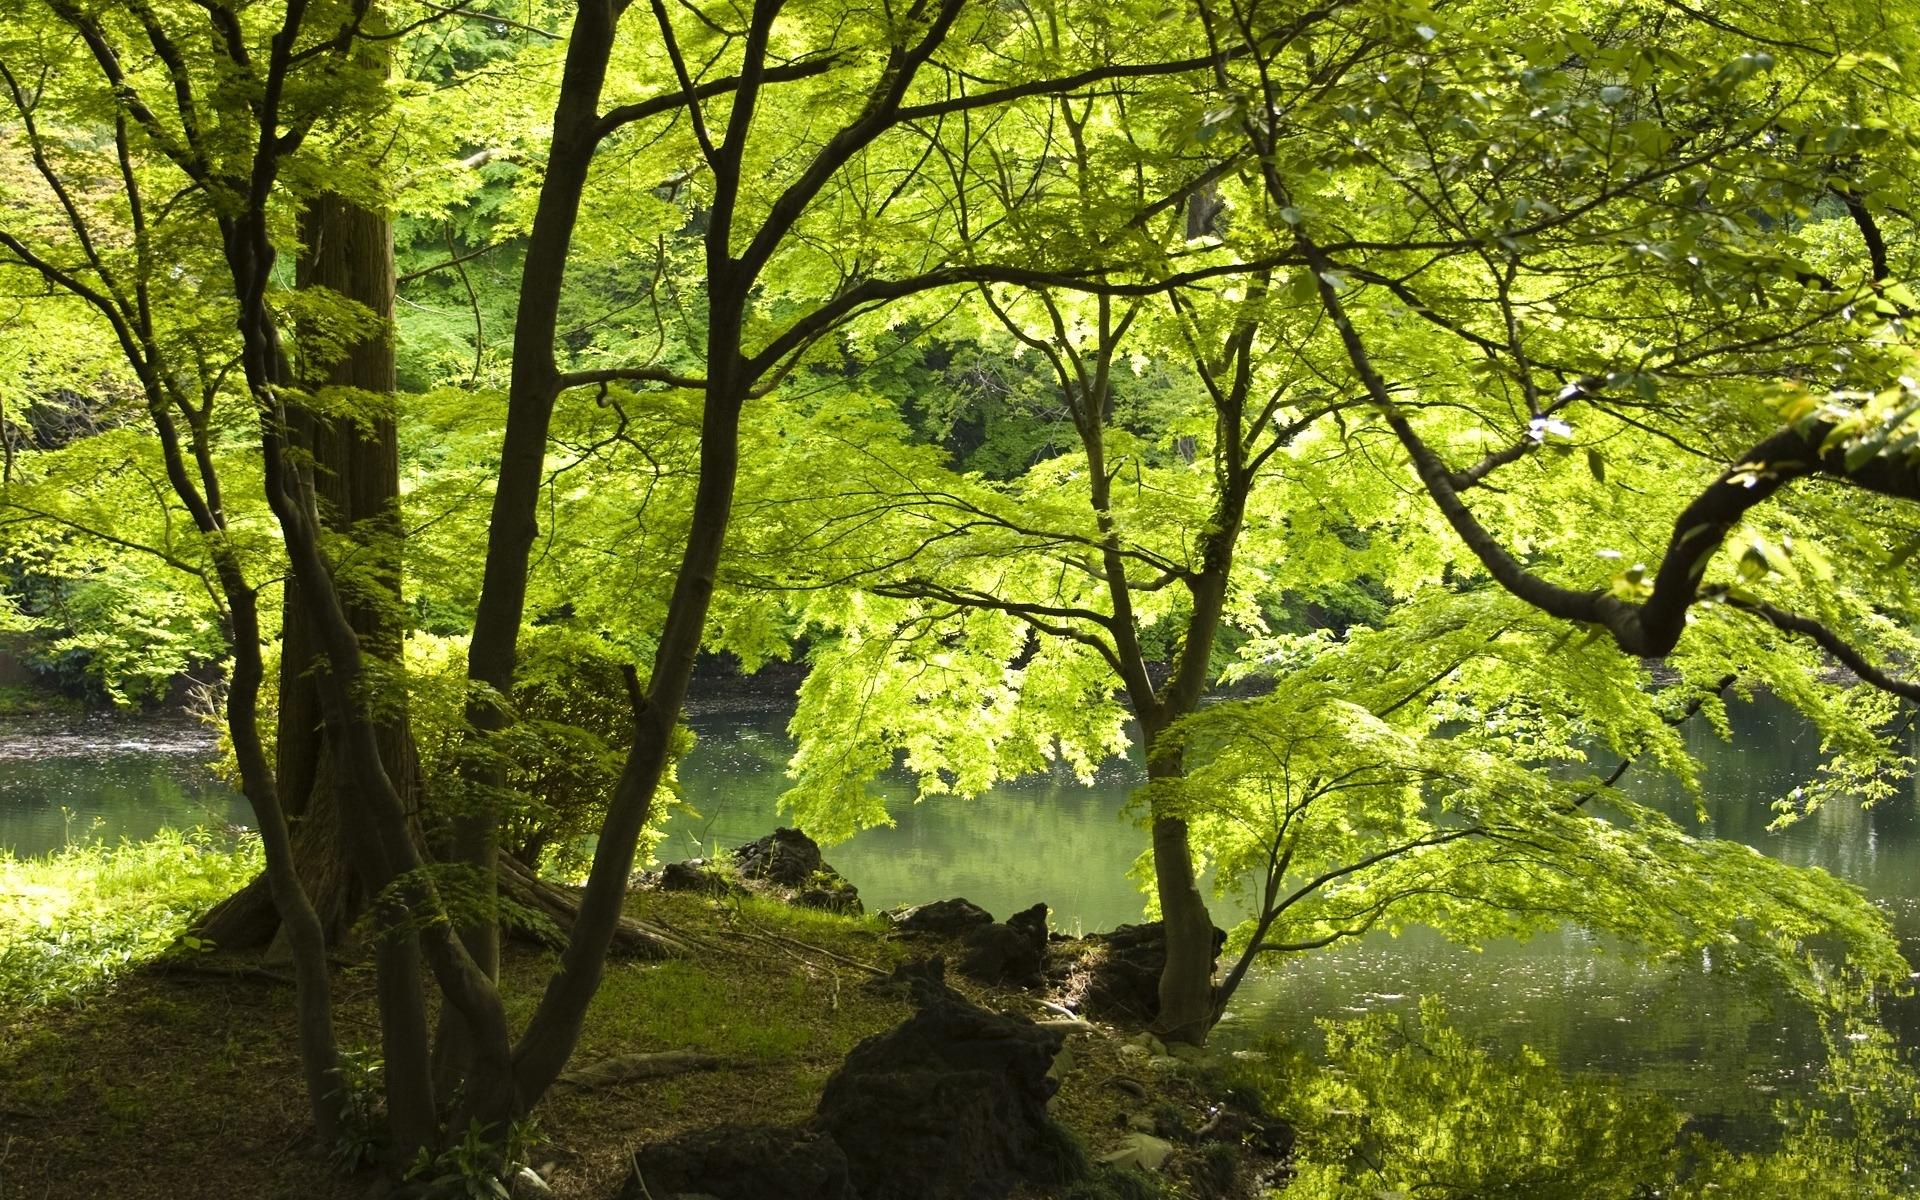 Картинки Деревья, озеро, берег, листва, лето, вода фото и обои на рабочий стол